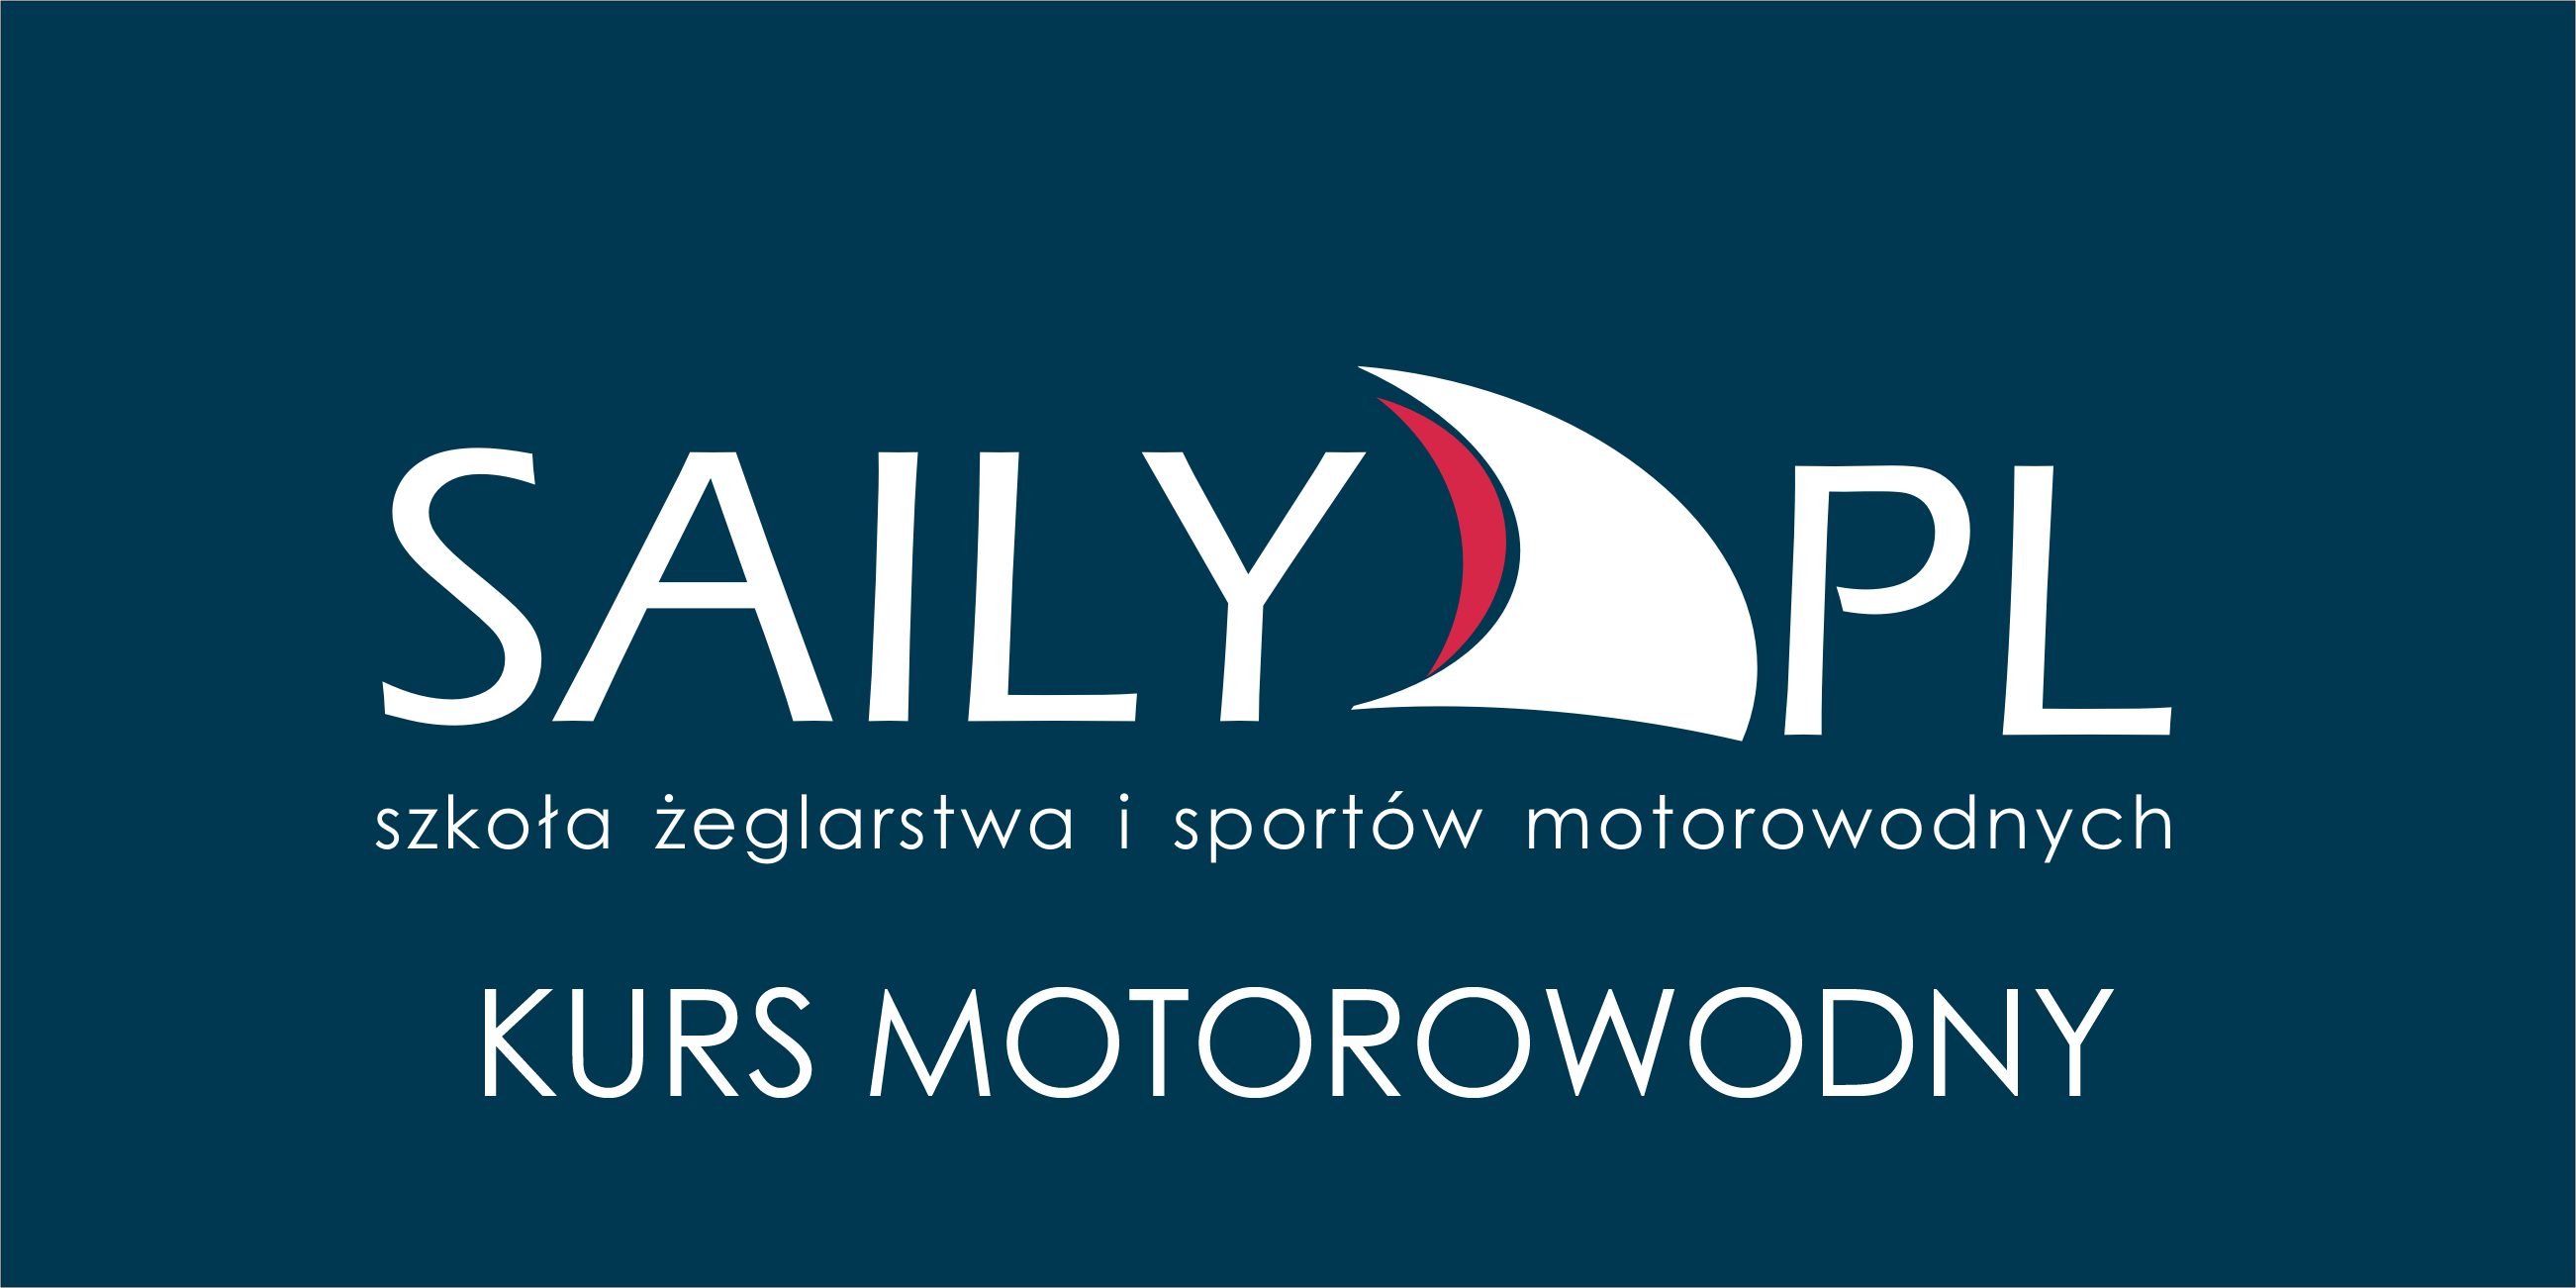 kurs_motorowodny